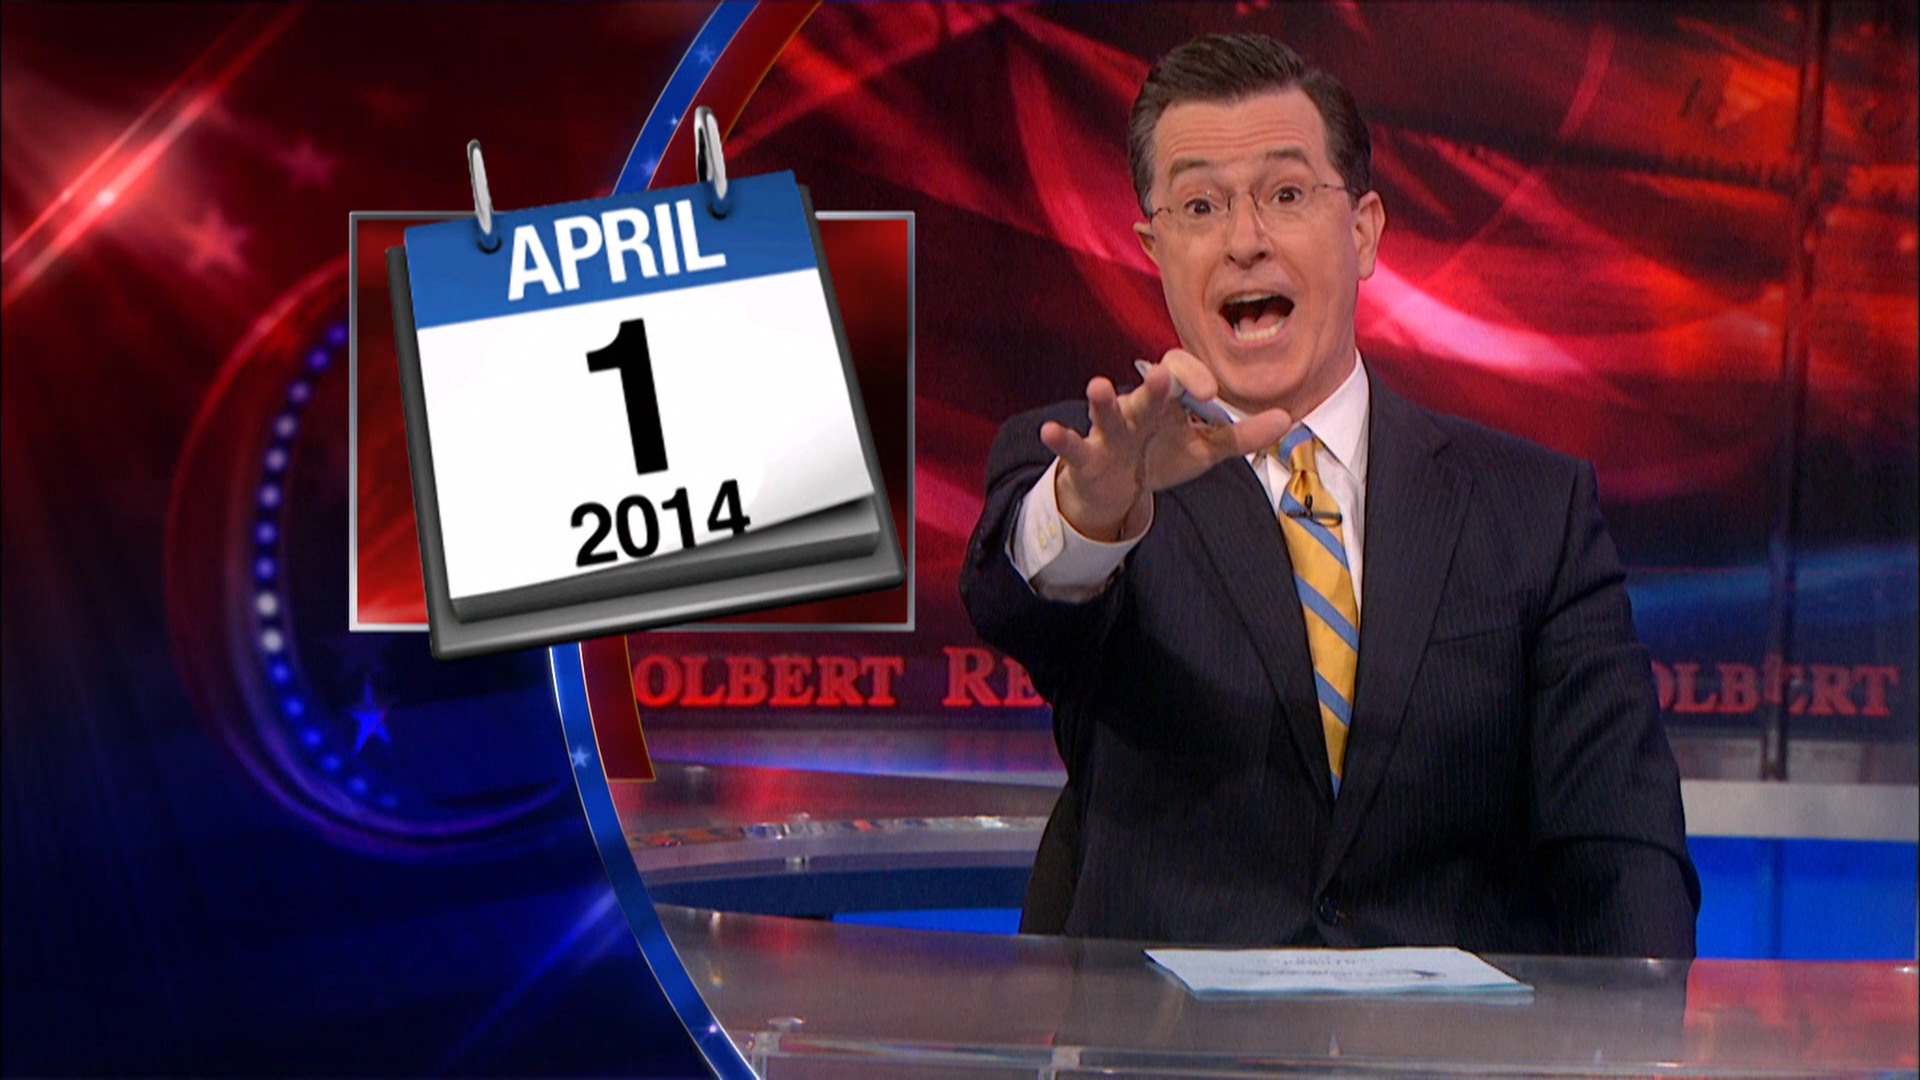 April 1, 2014 - John Malkovich